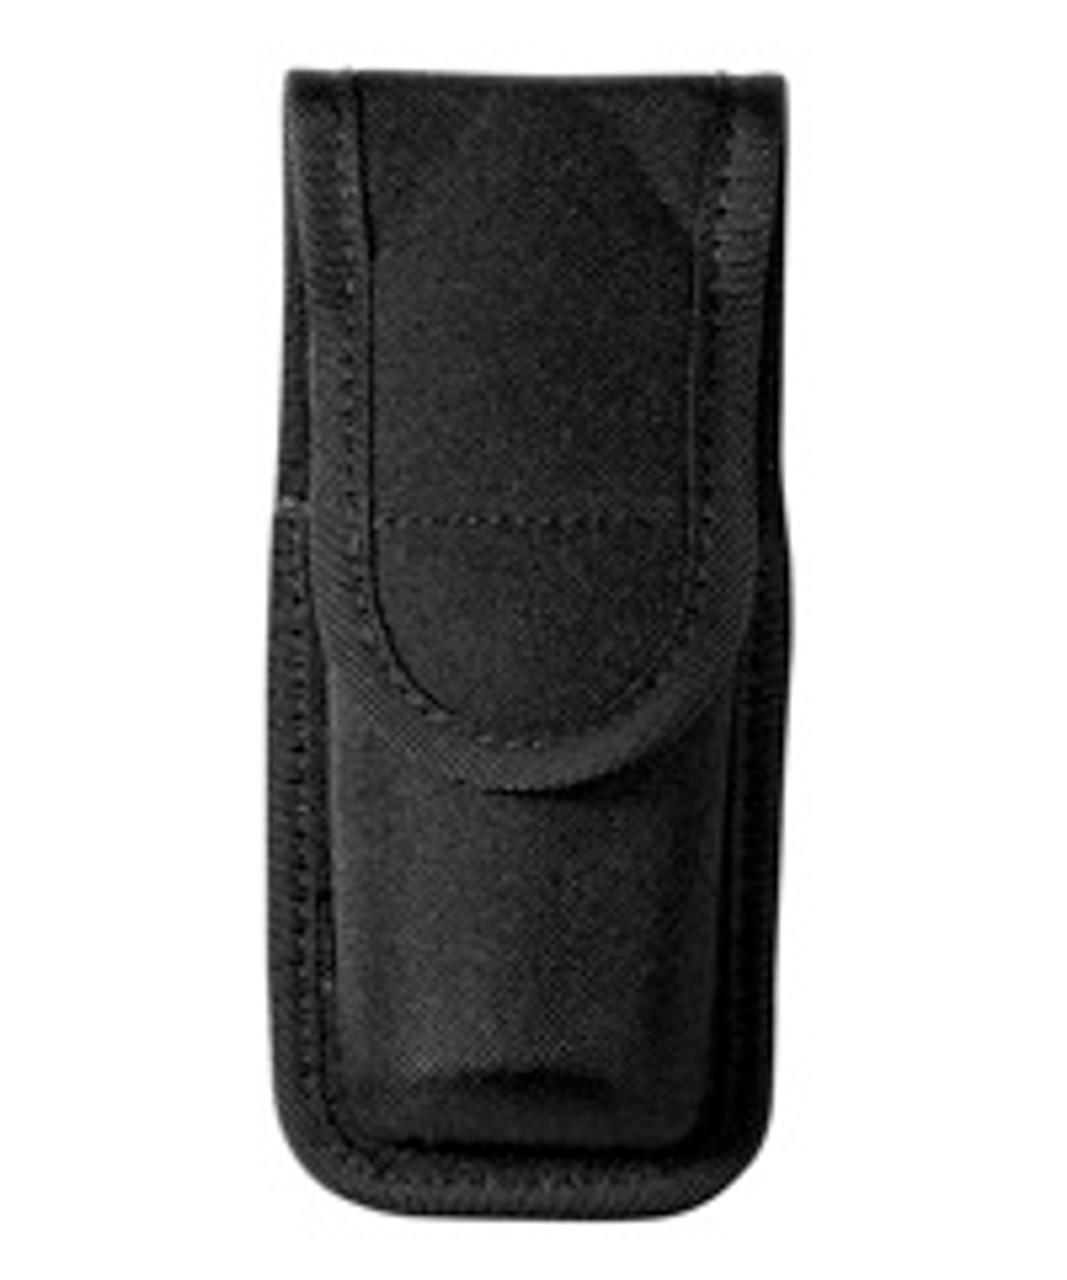 "Mace/Oce Spray Holder 7.5"" can"